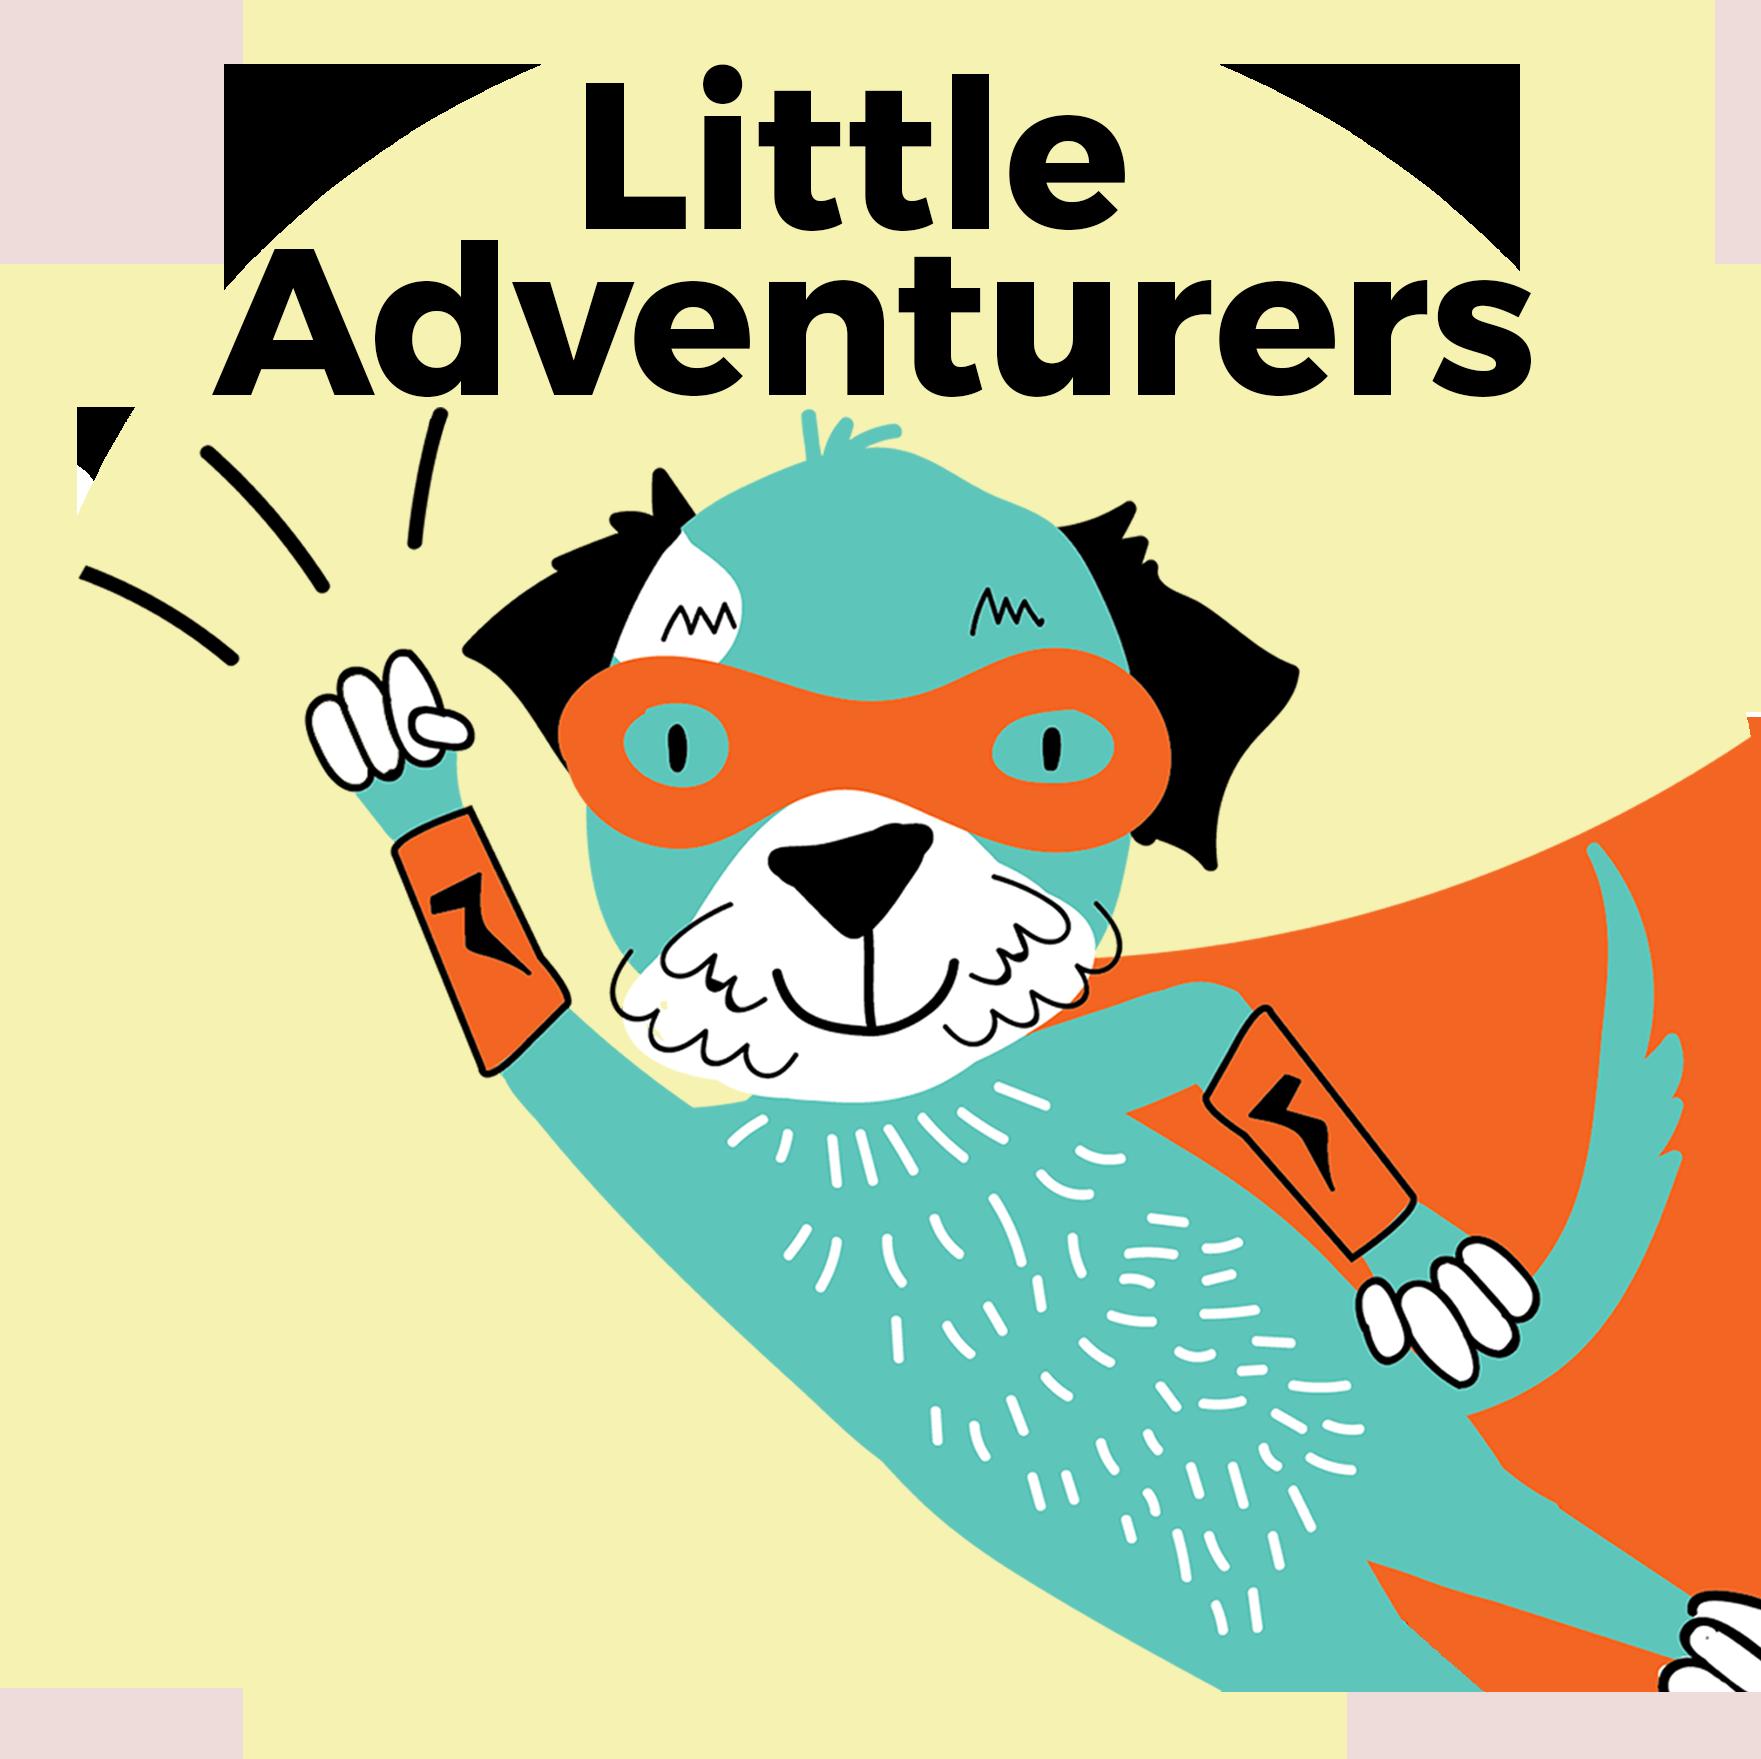 Little Adventurers (3).png